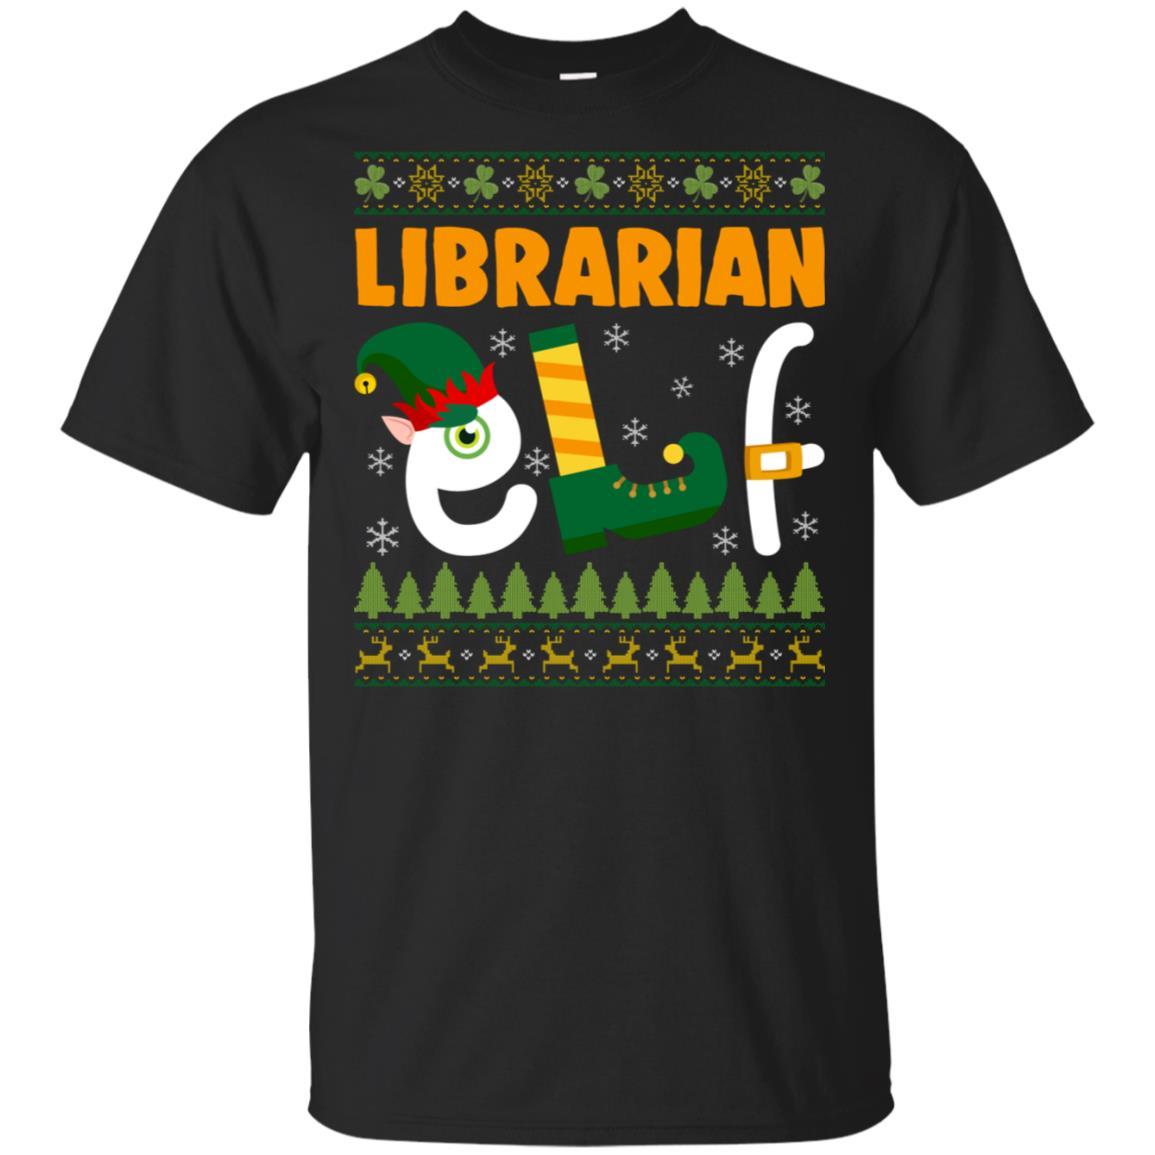 Librarian Elf Unisex Short Sleeve